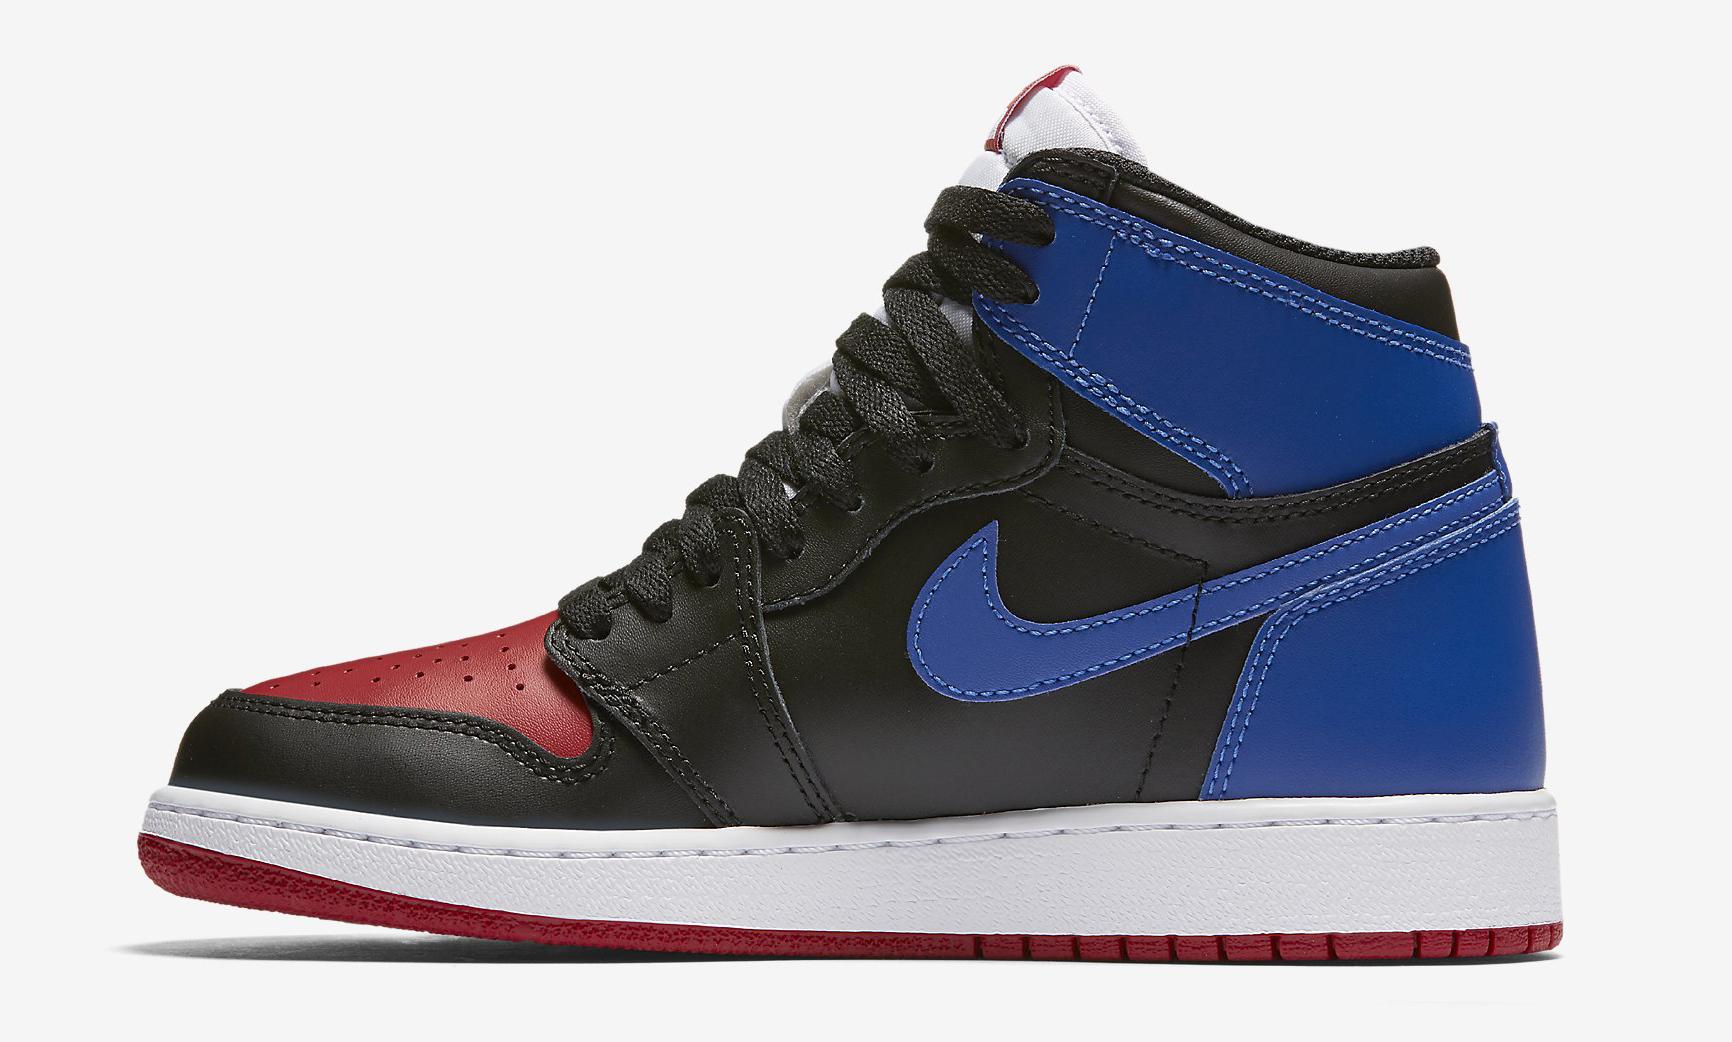 competitive price f9d07 08458 Image via Nike Top 3 Jordan 1 GS Medial